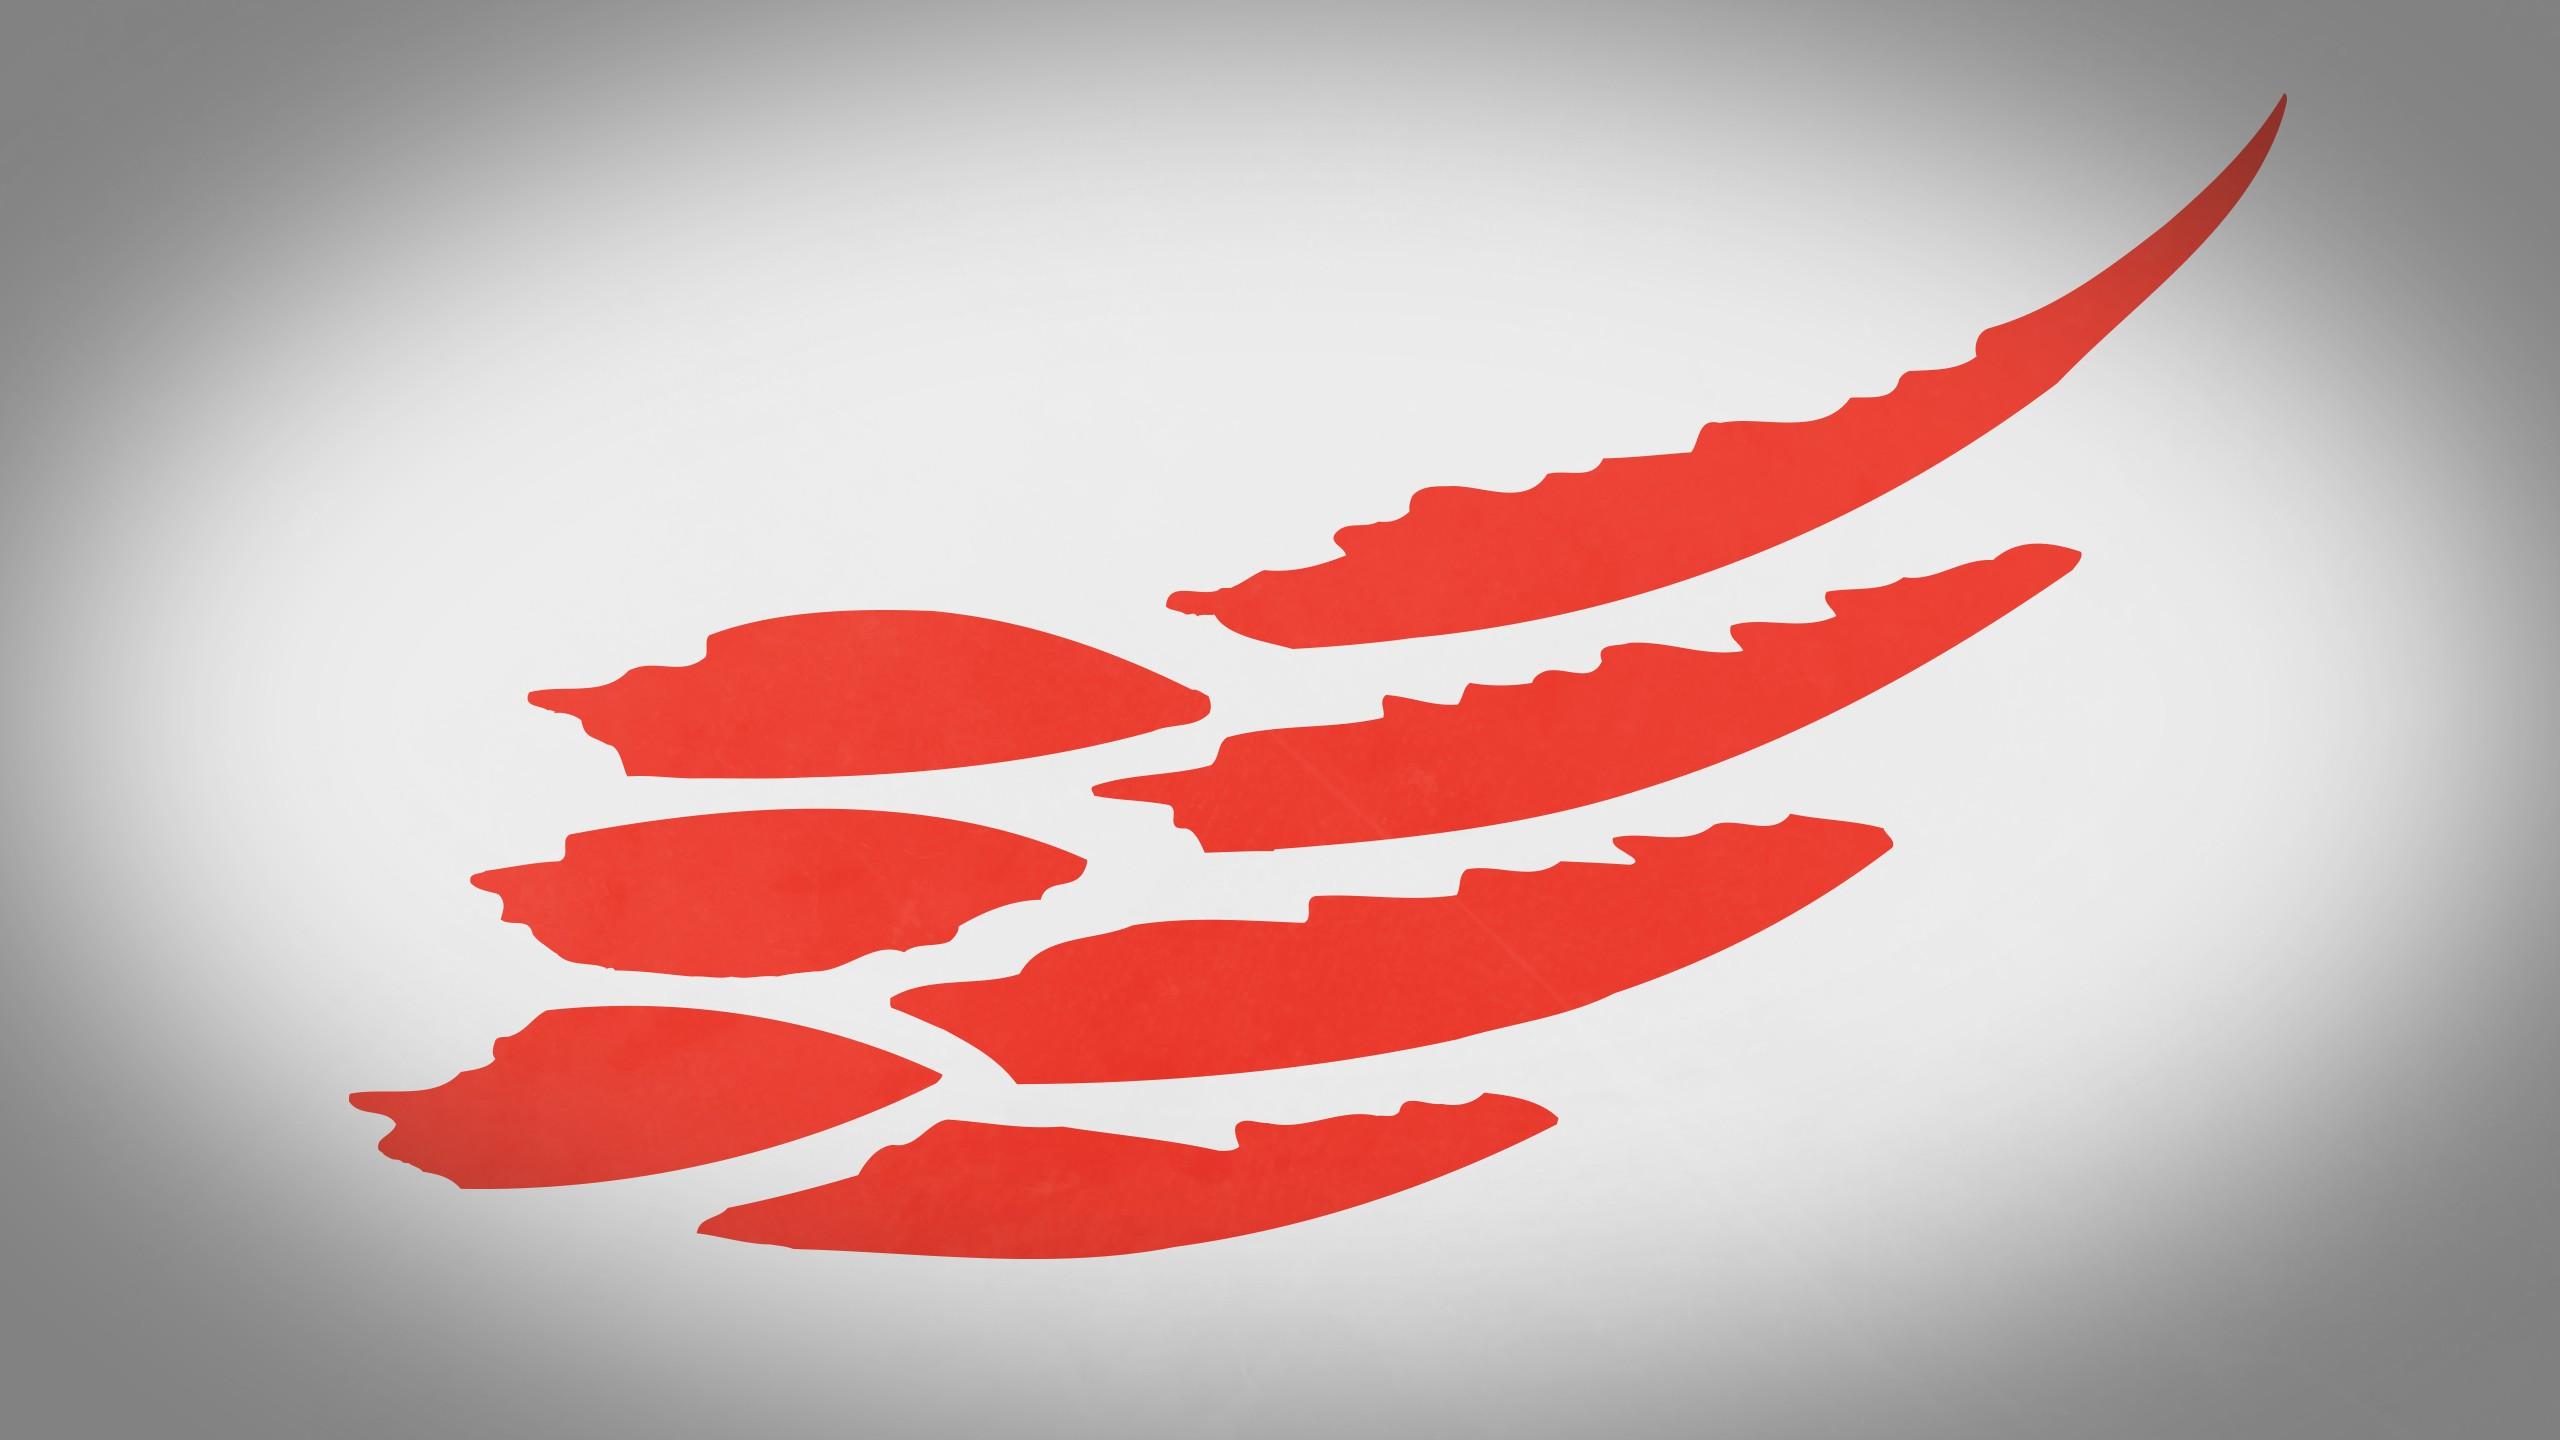 Detroit Red Wings Computer Wallpapers Desktop Backgrounds 2560x1440 2560x1440